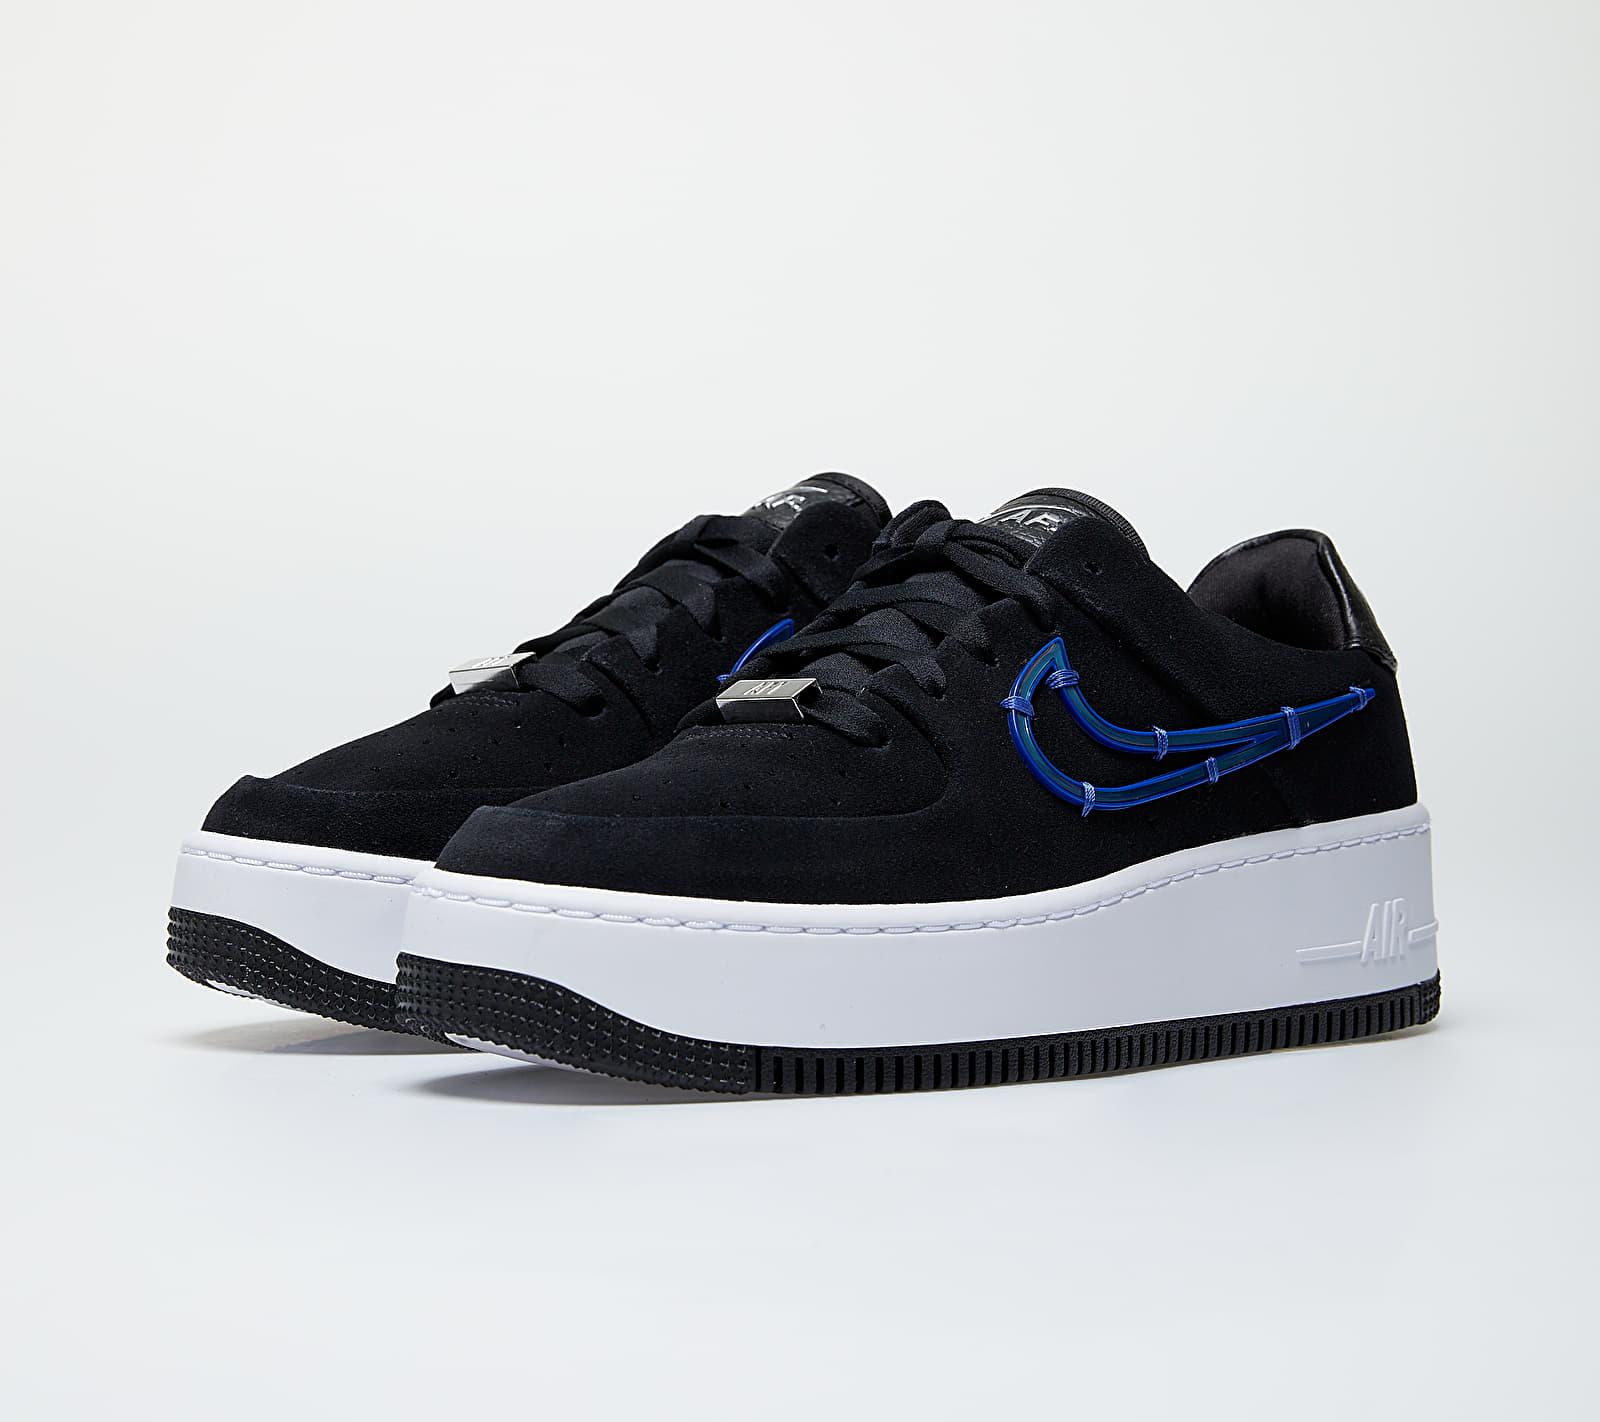 Nike W Air Force 1 Sage Low LX Black/ Deep Royal Blue-Metallic Silver